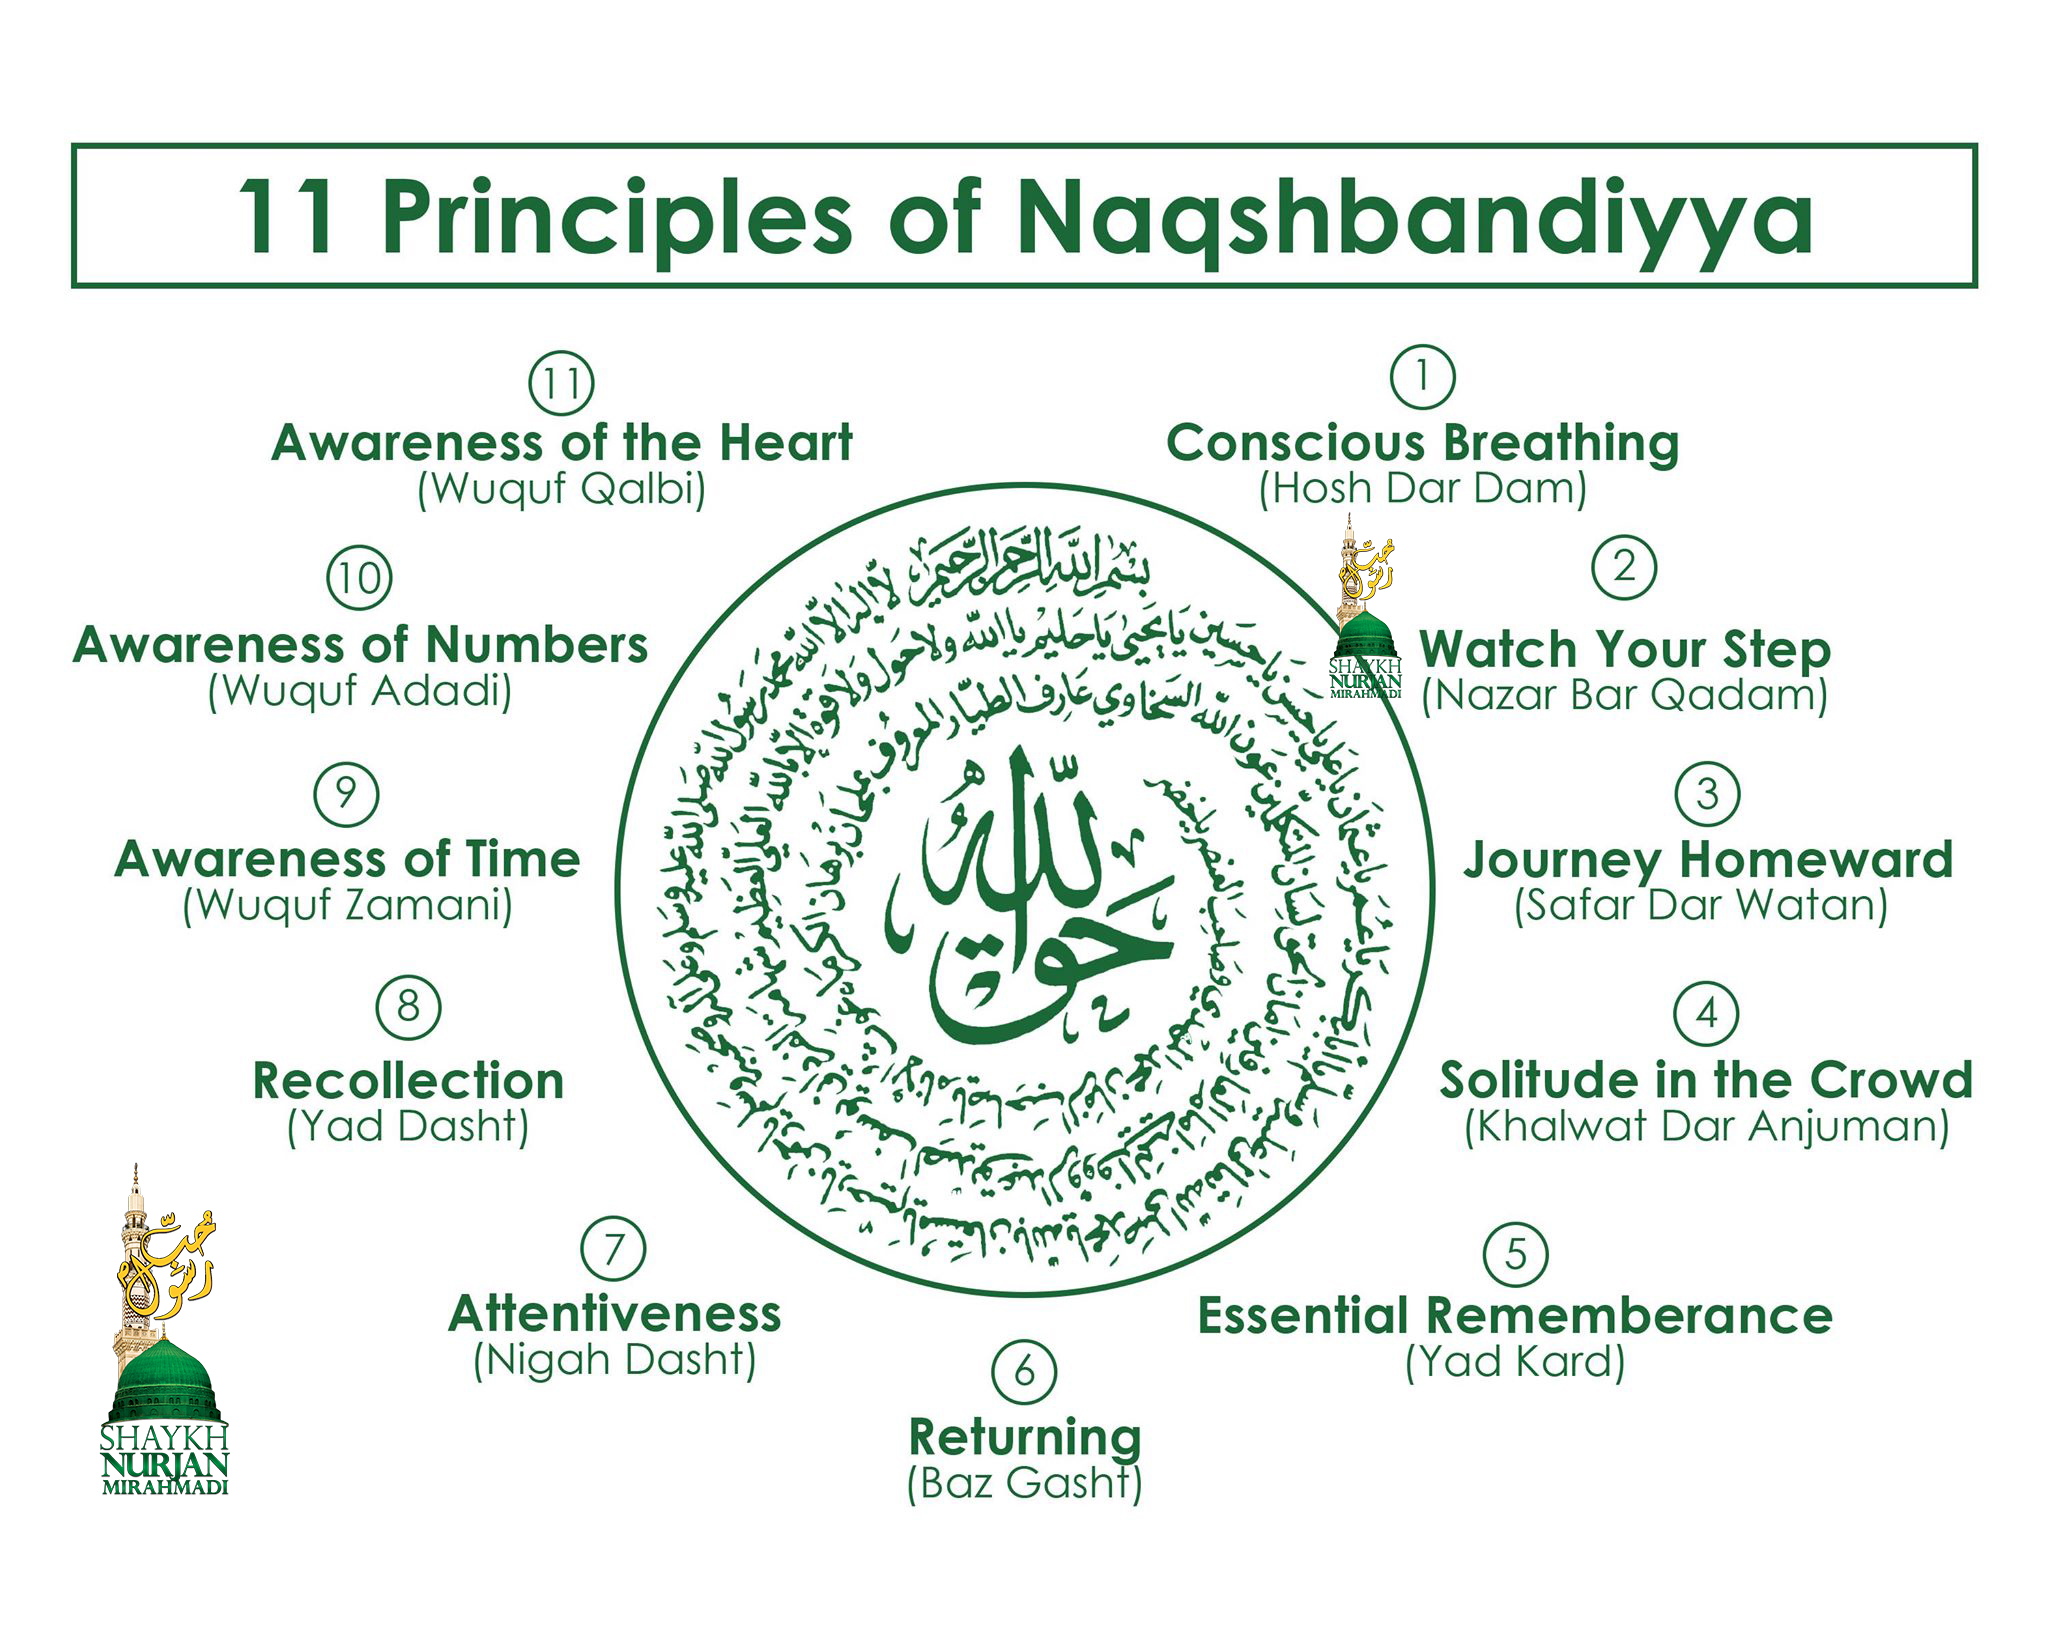 11 eleven principles of Naqshbandiyya Mawlana Shah Naqshband